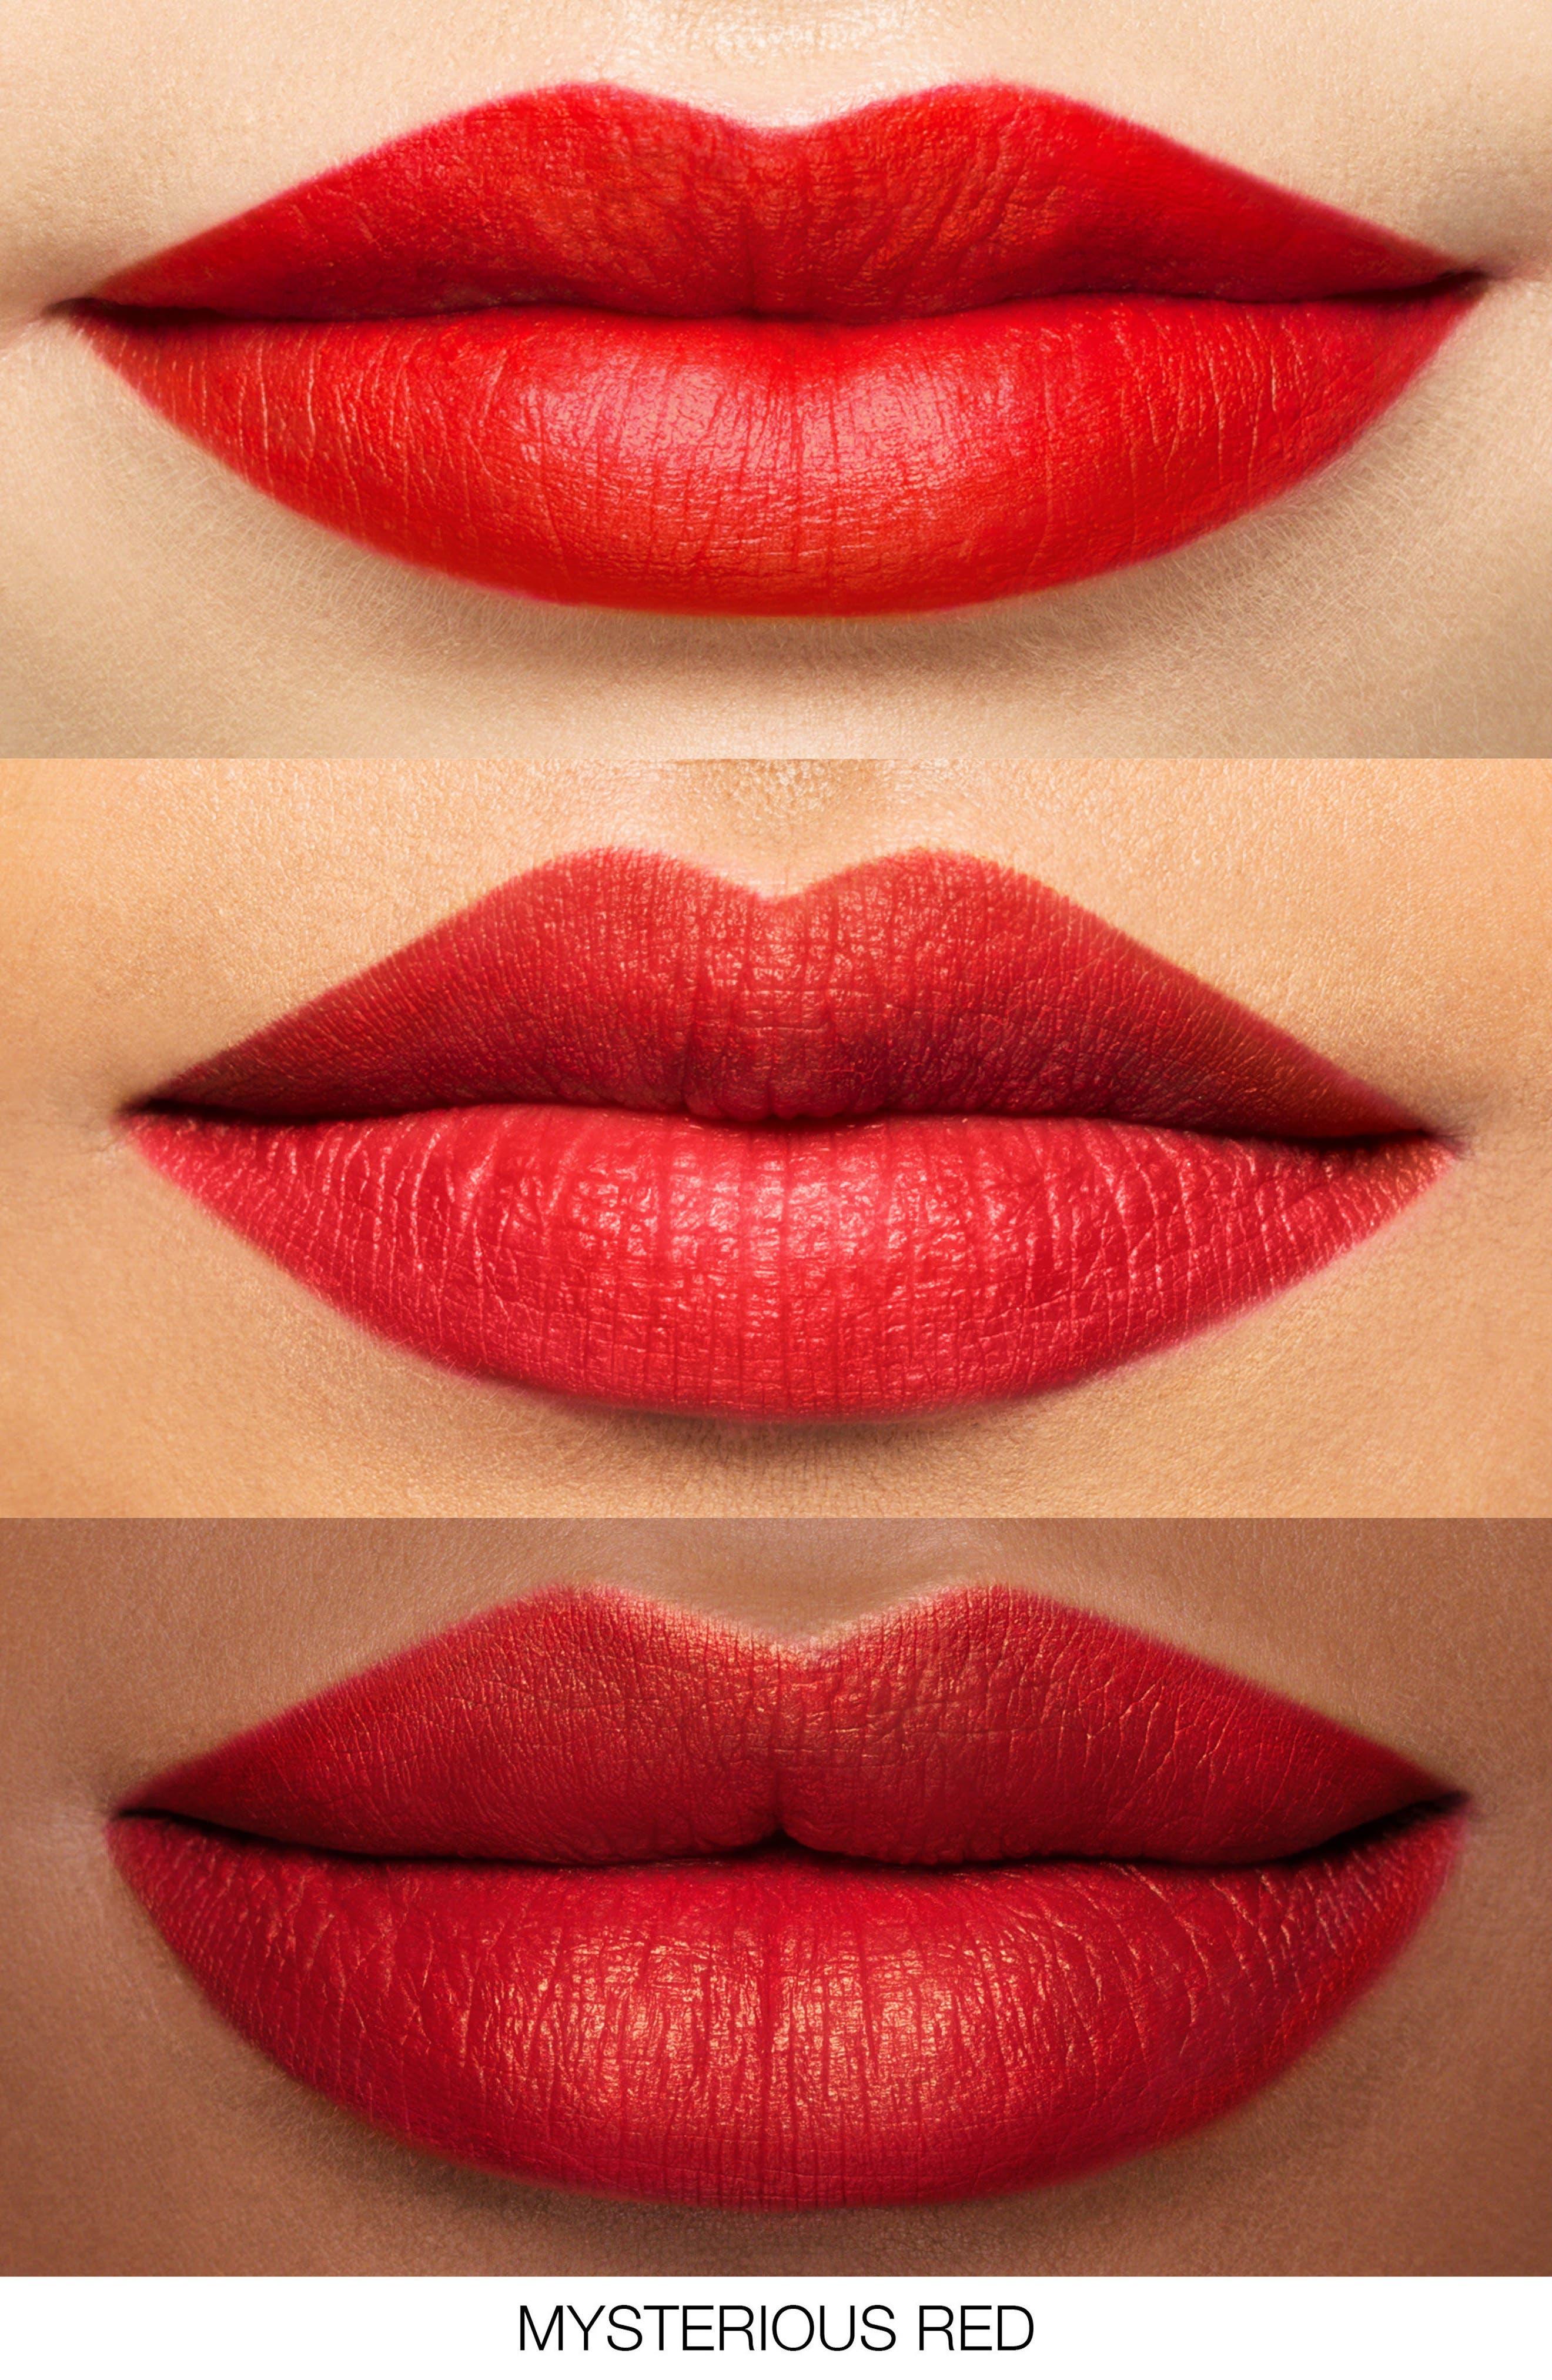 Velvet Matte Lipstick Pencil,                             Alternate thumbnail 2, color,                             Mysterious Red